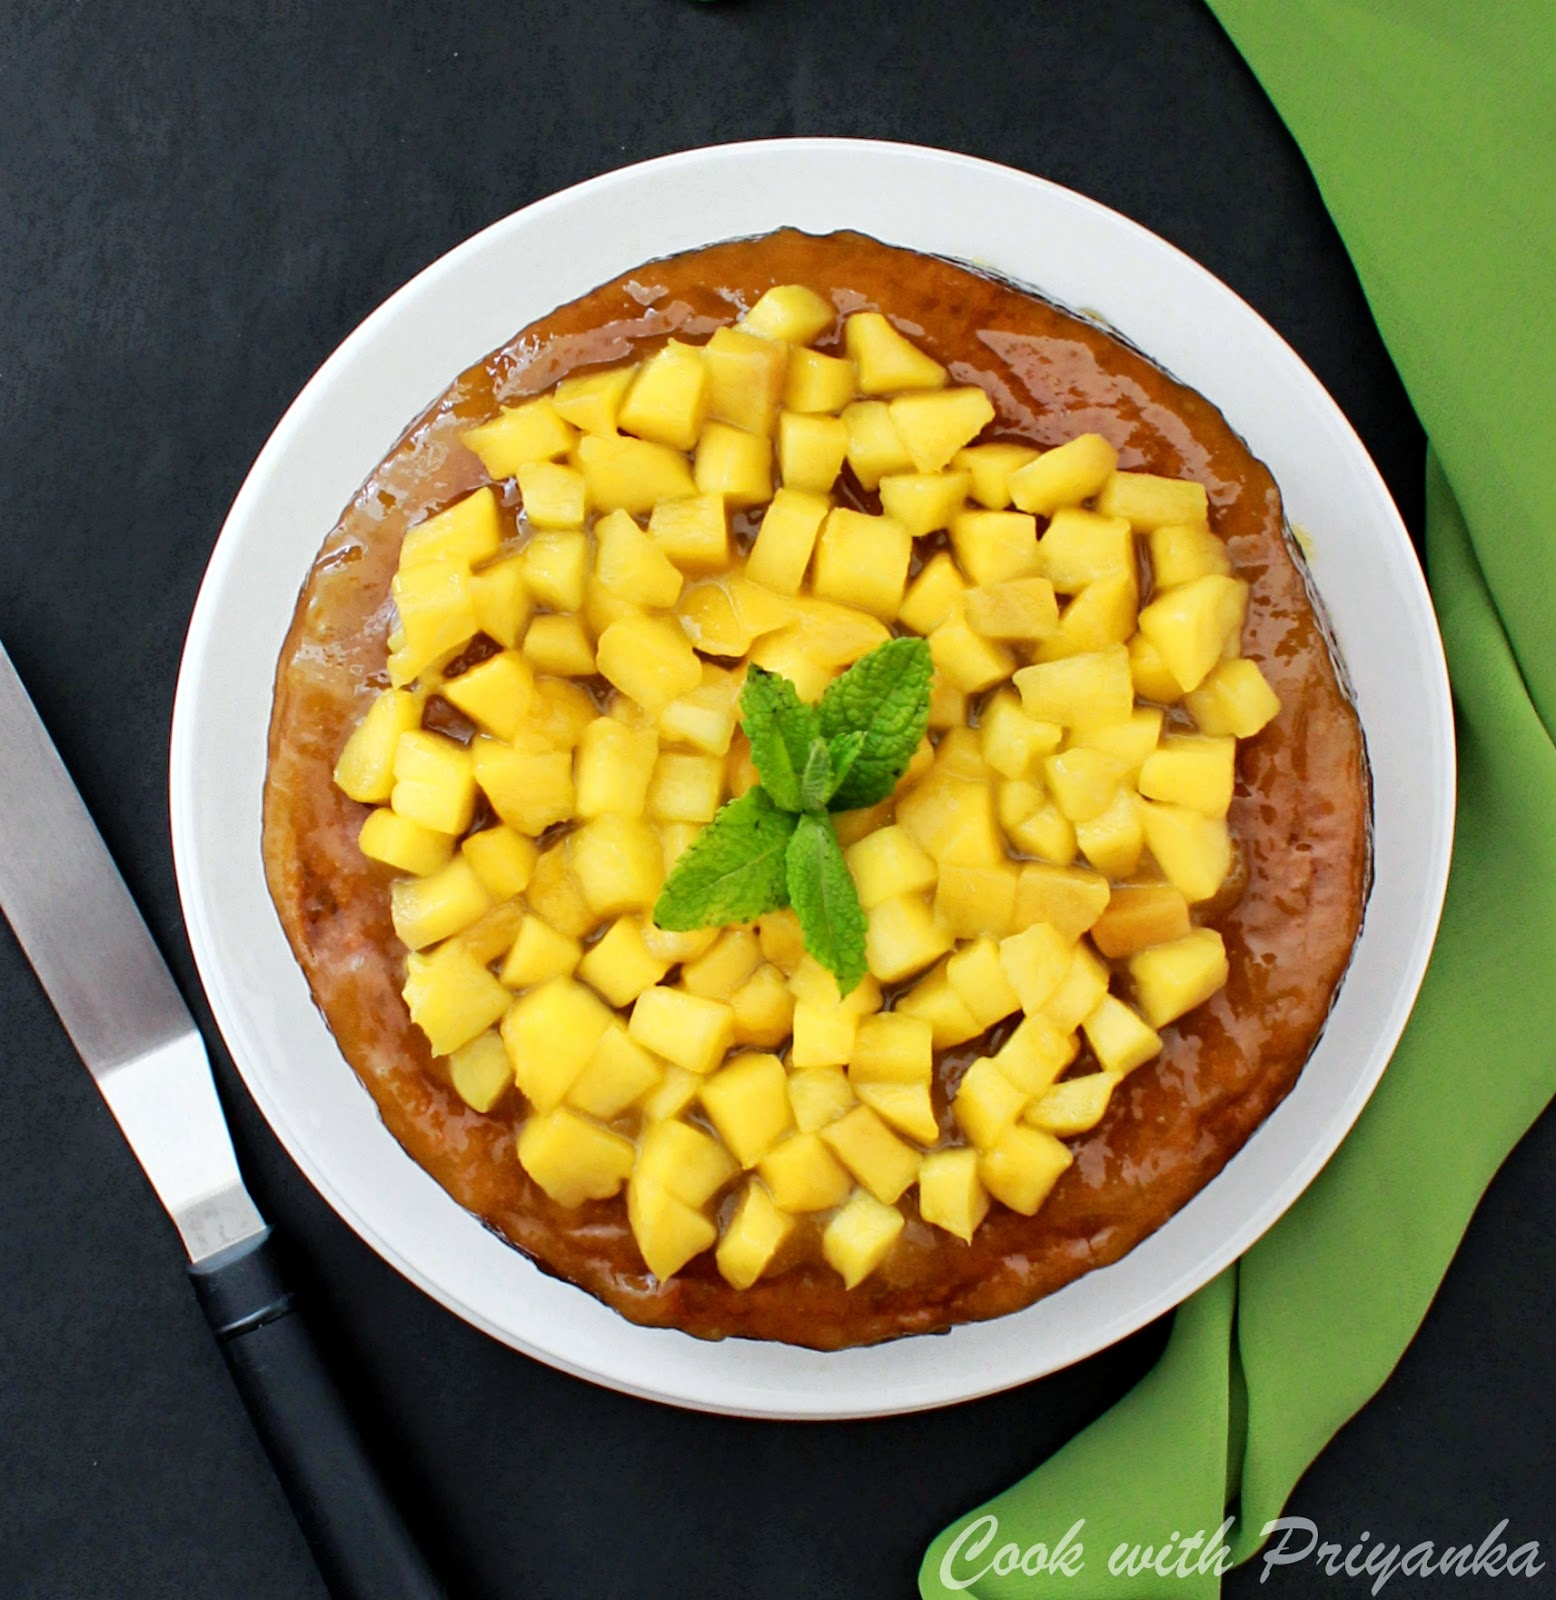 http://cookwithpriyankavarma.blogspot.co.uk/2014/06/mango-cake-eggless.html